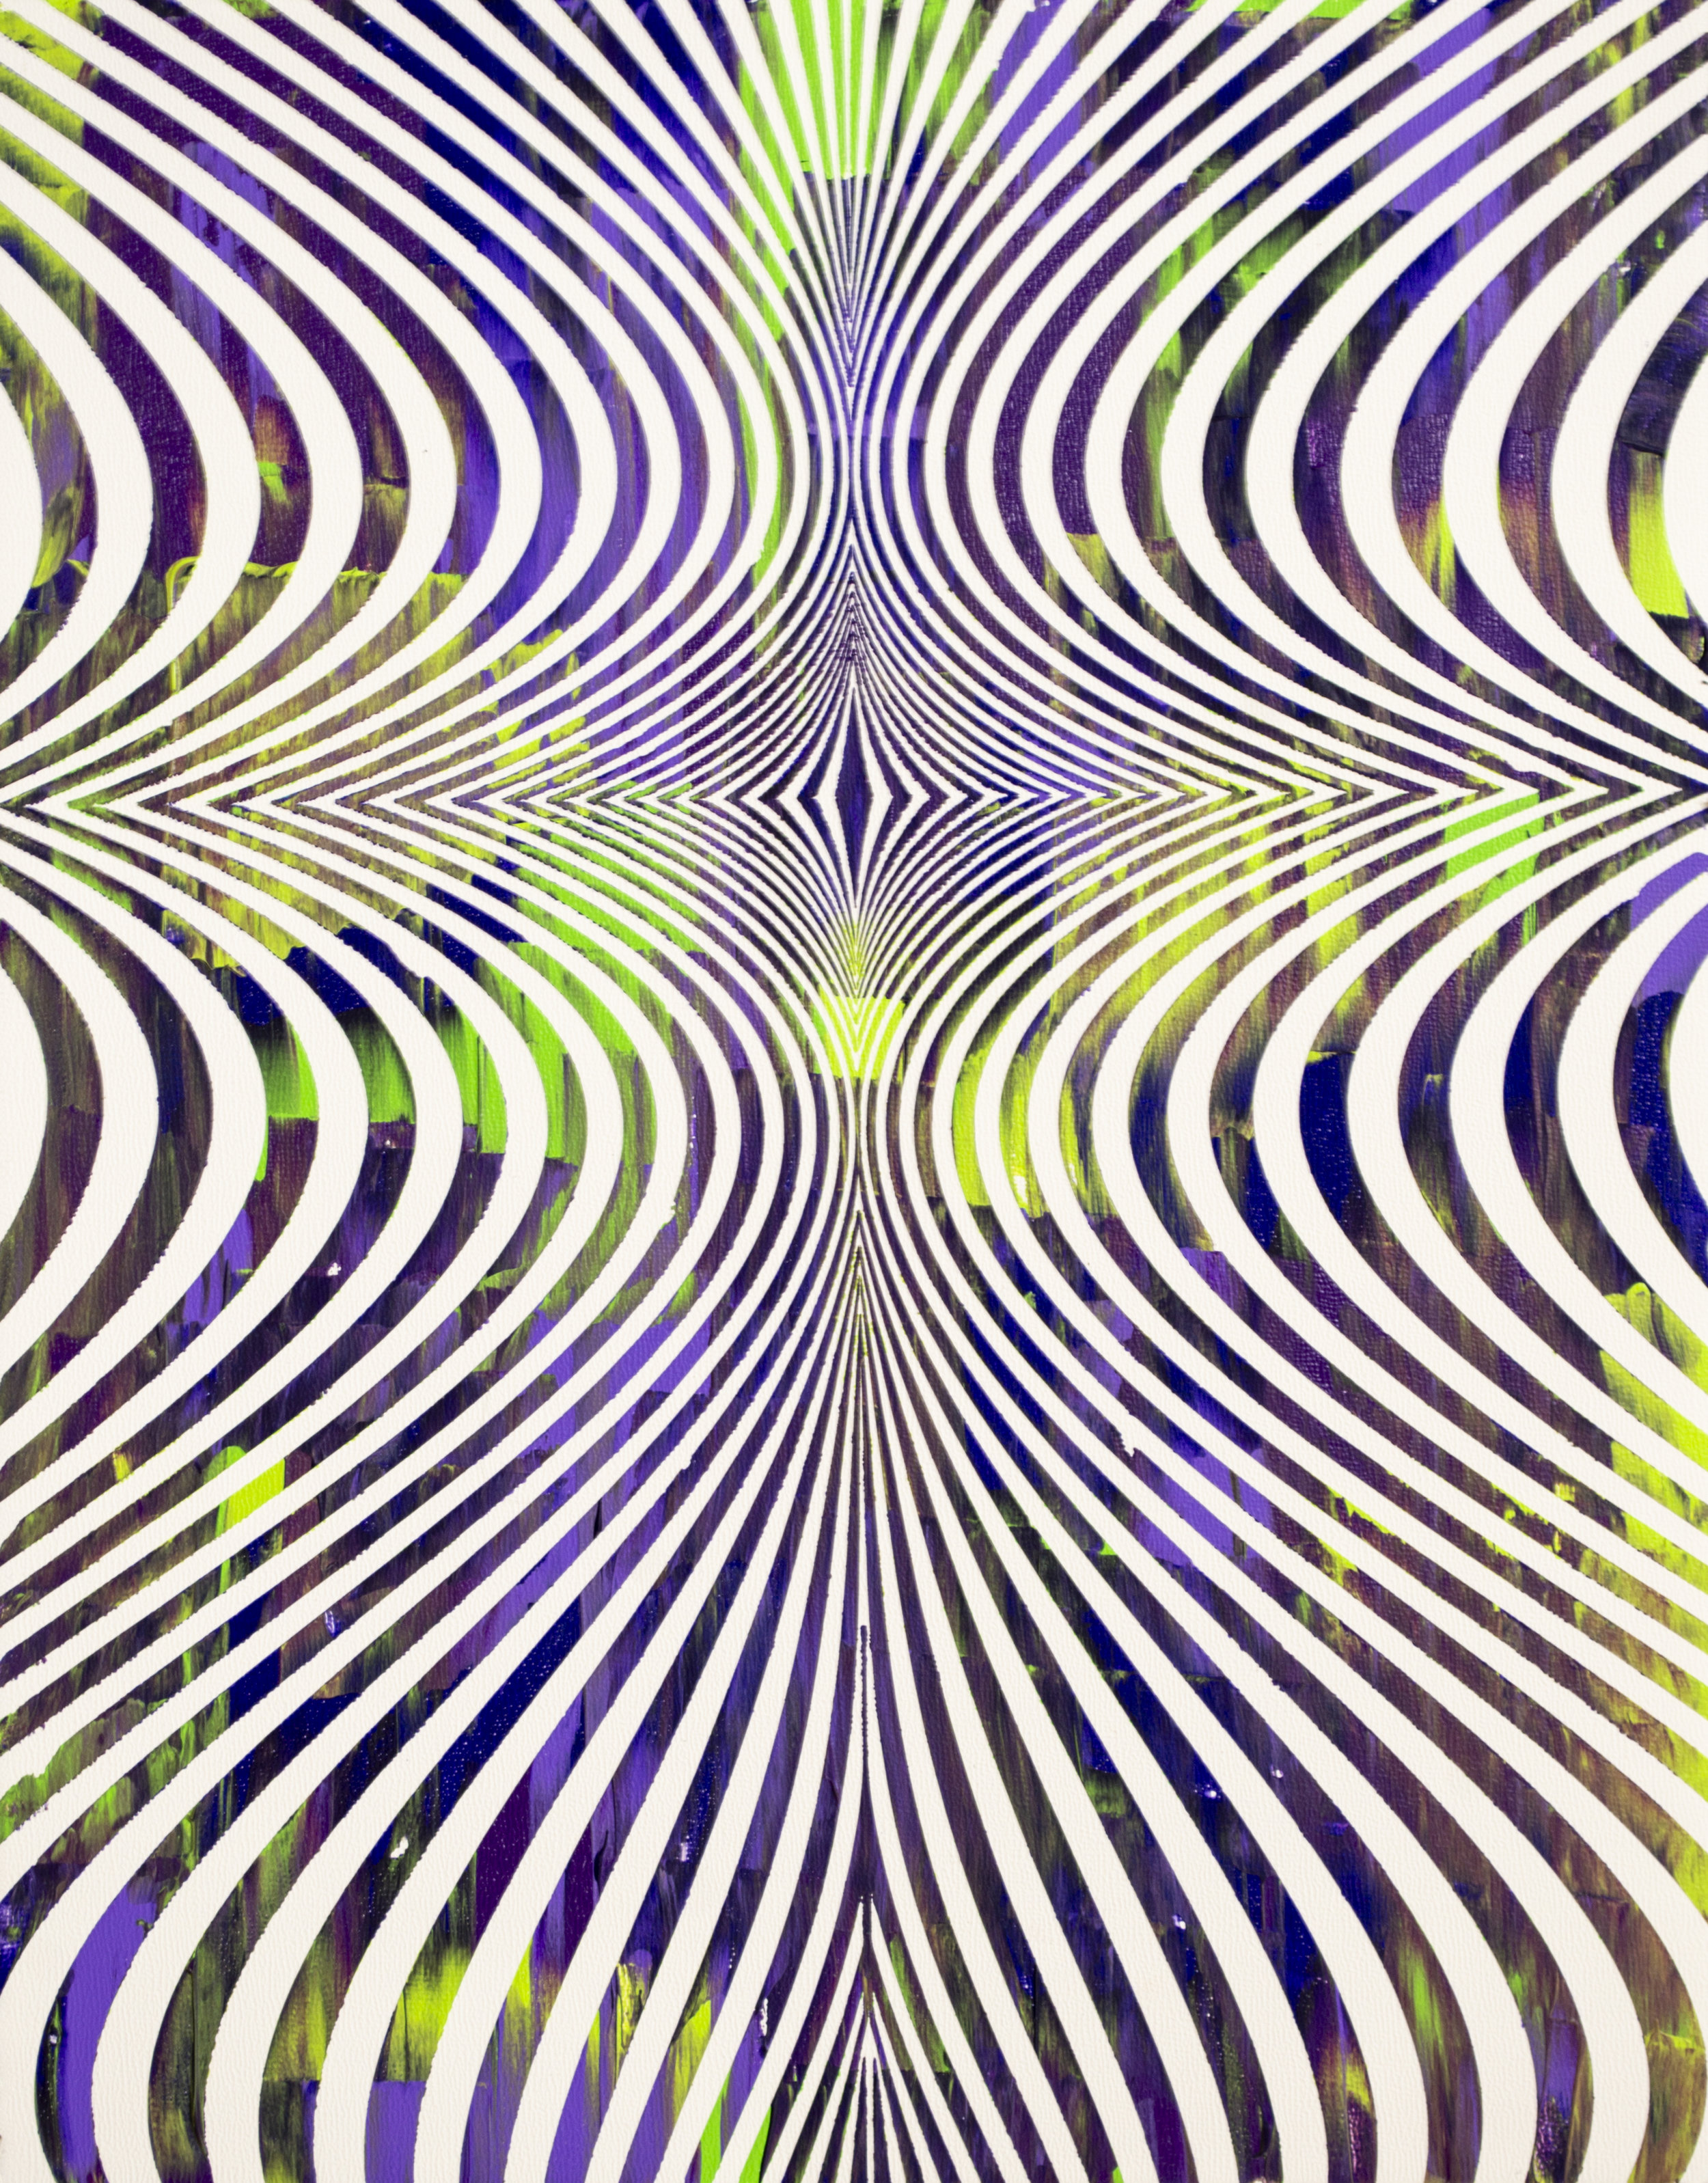 HUE Gallery of Contemporary Art - Sean Christopher Ward - The Hookah - Acrylic on MDF - 11x14 - 2018 - $300.jpg